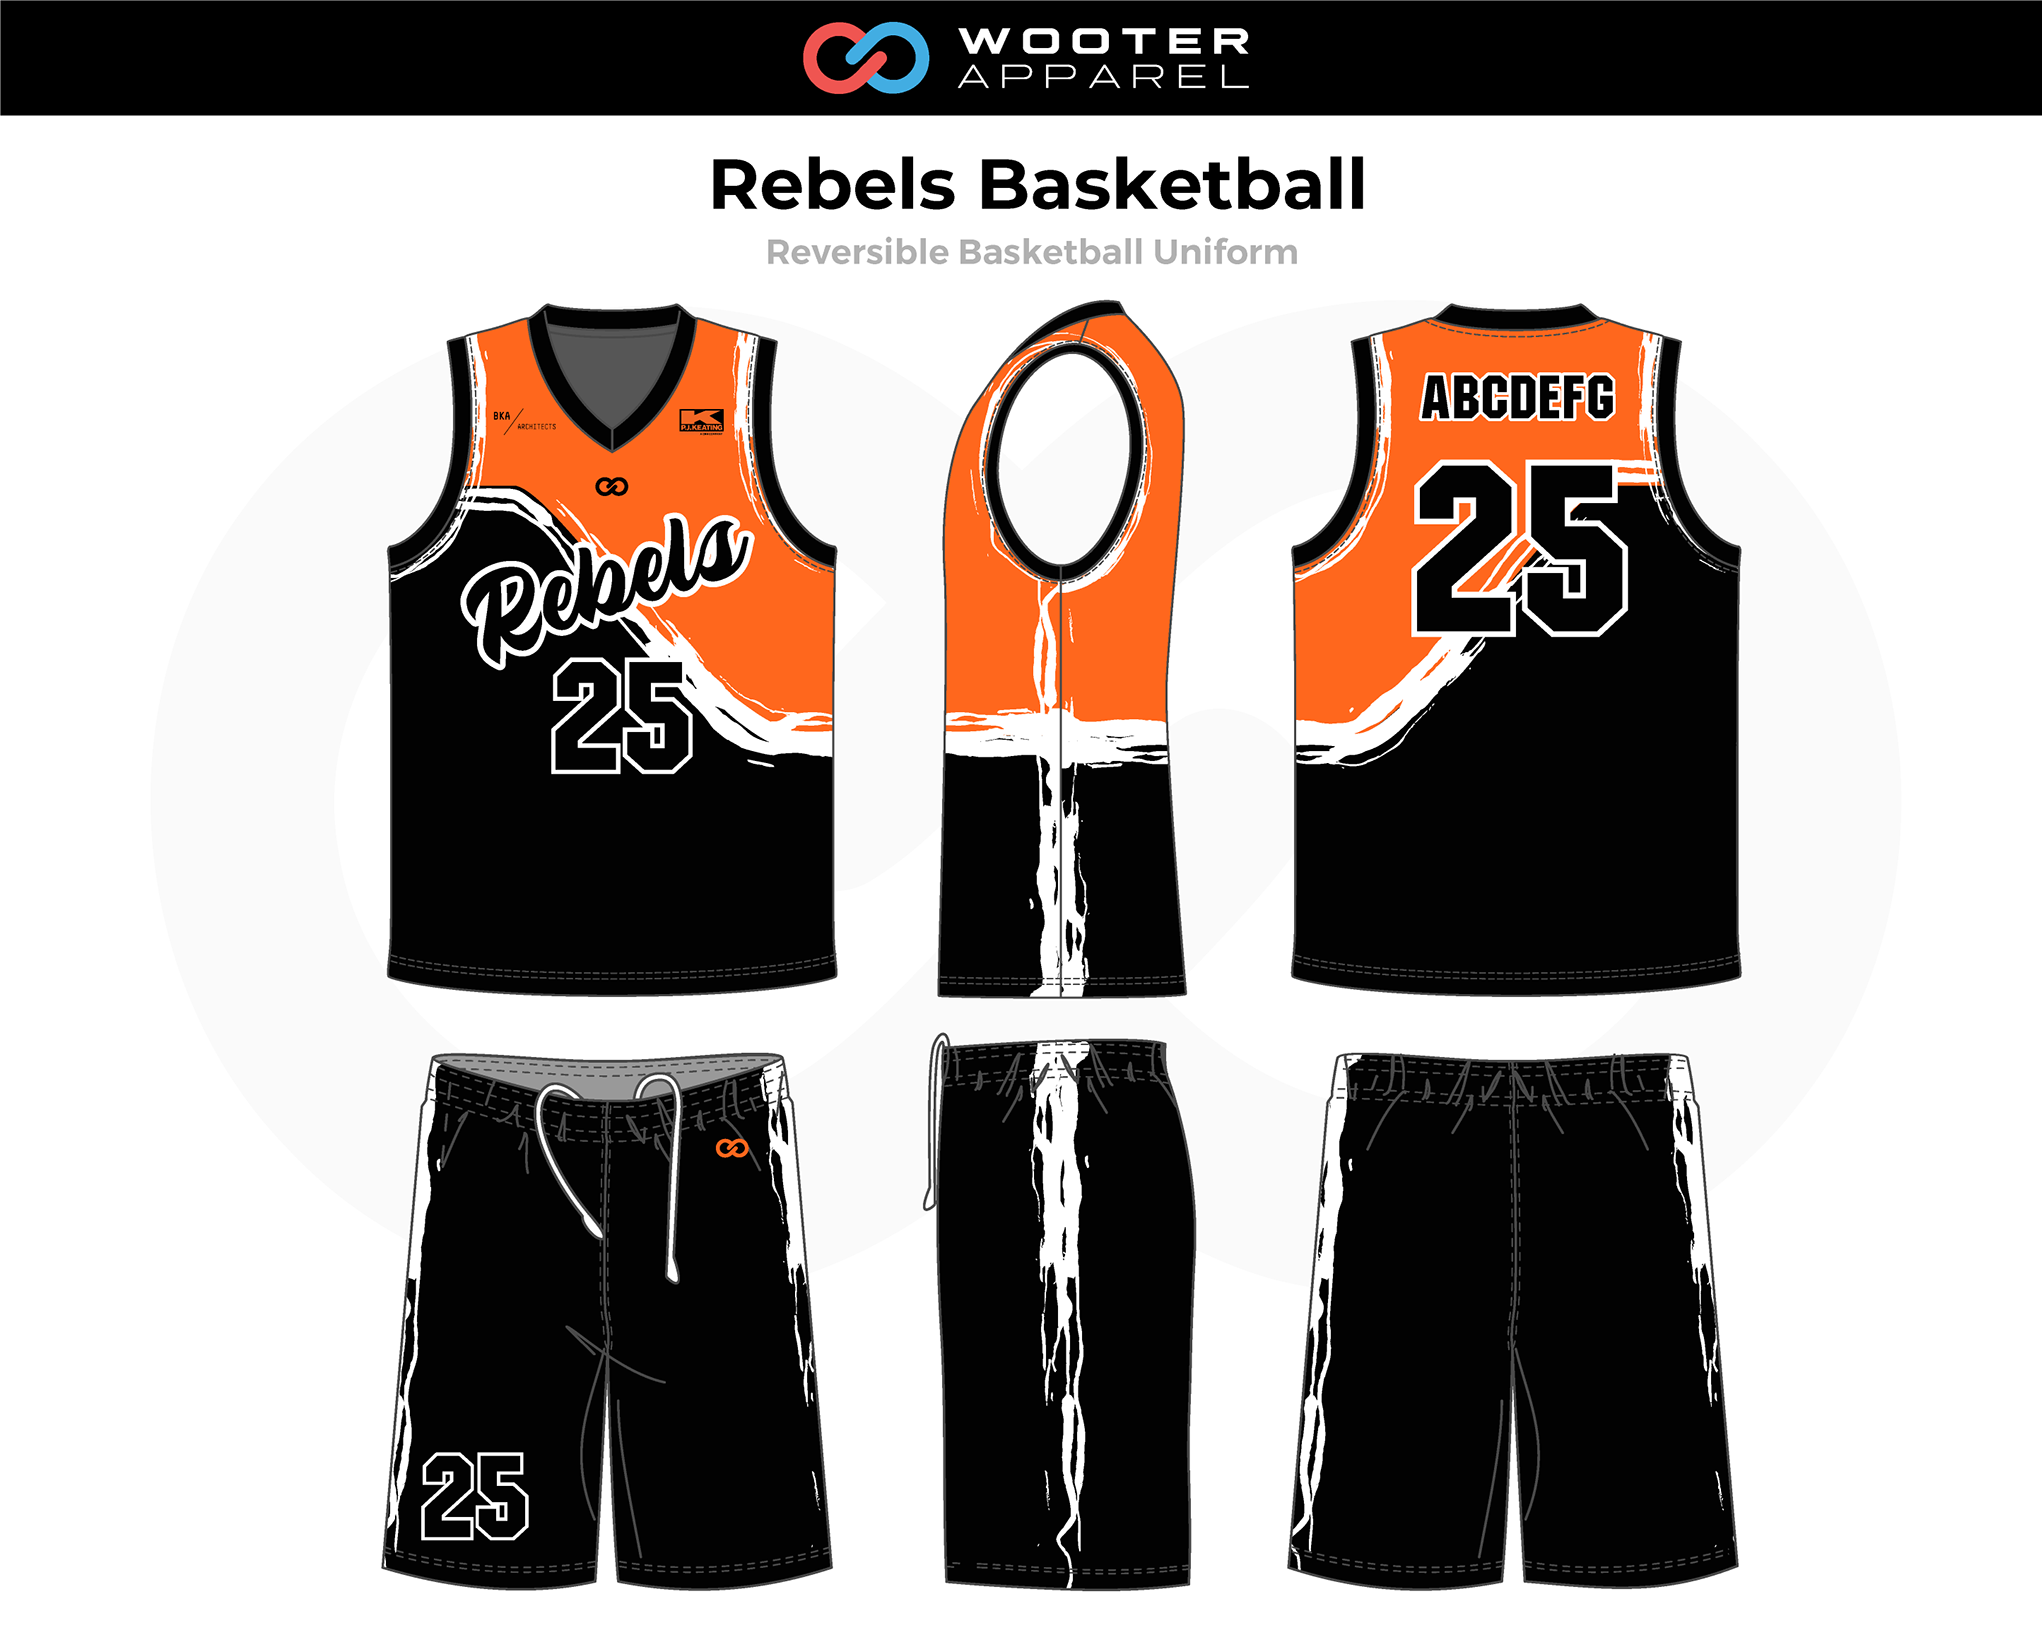 2019-02-26 Rebels Basketball Reversible Uniform (Side B).png